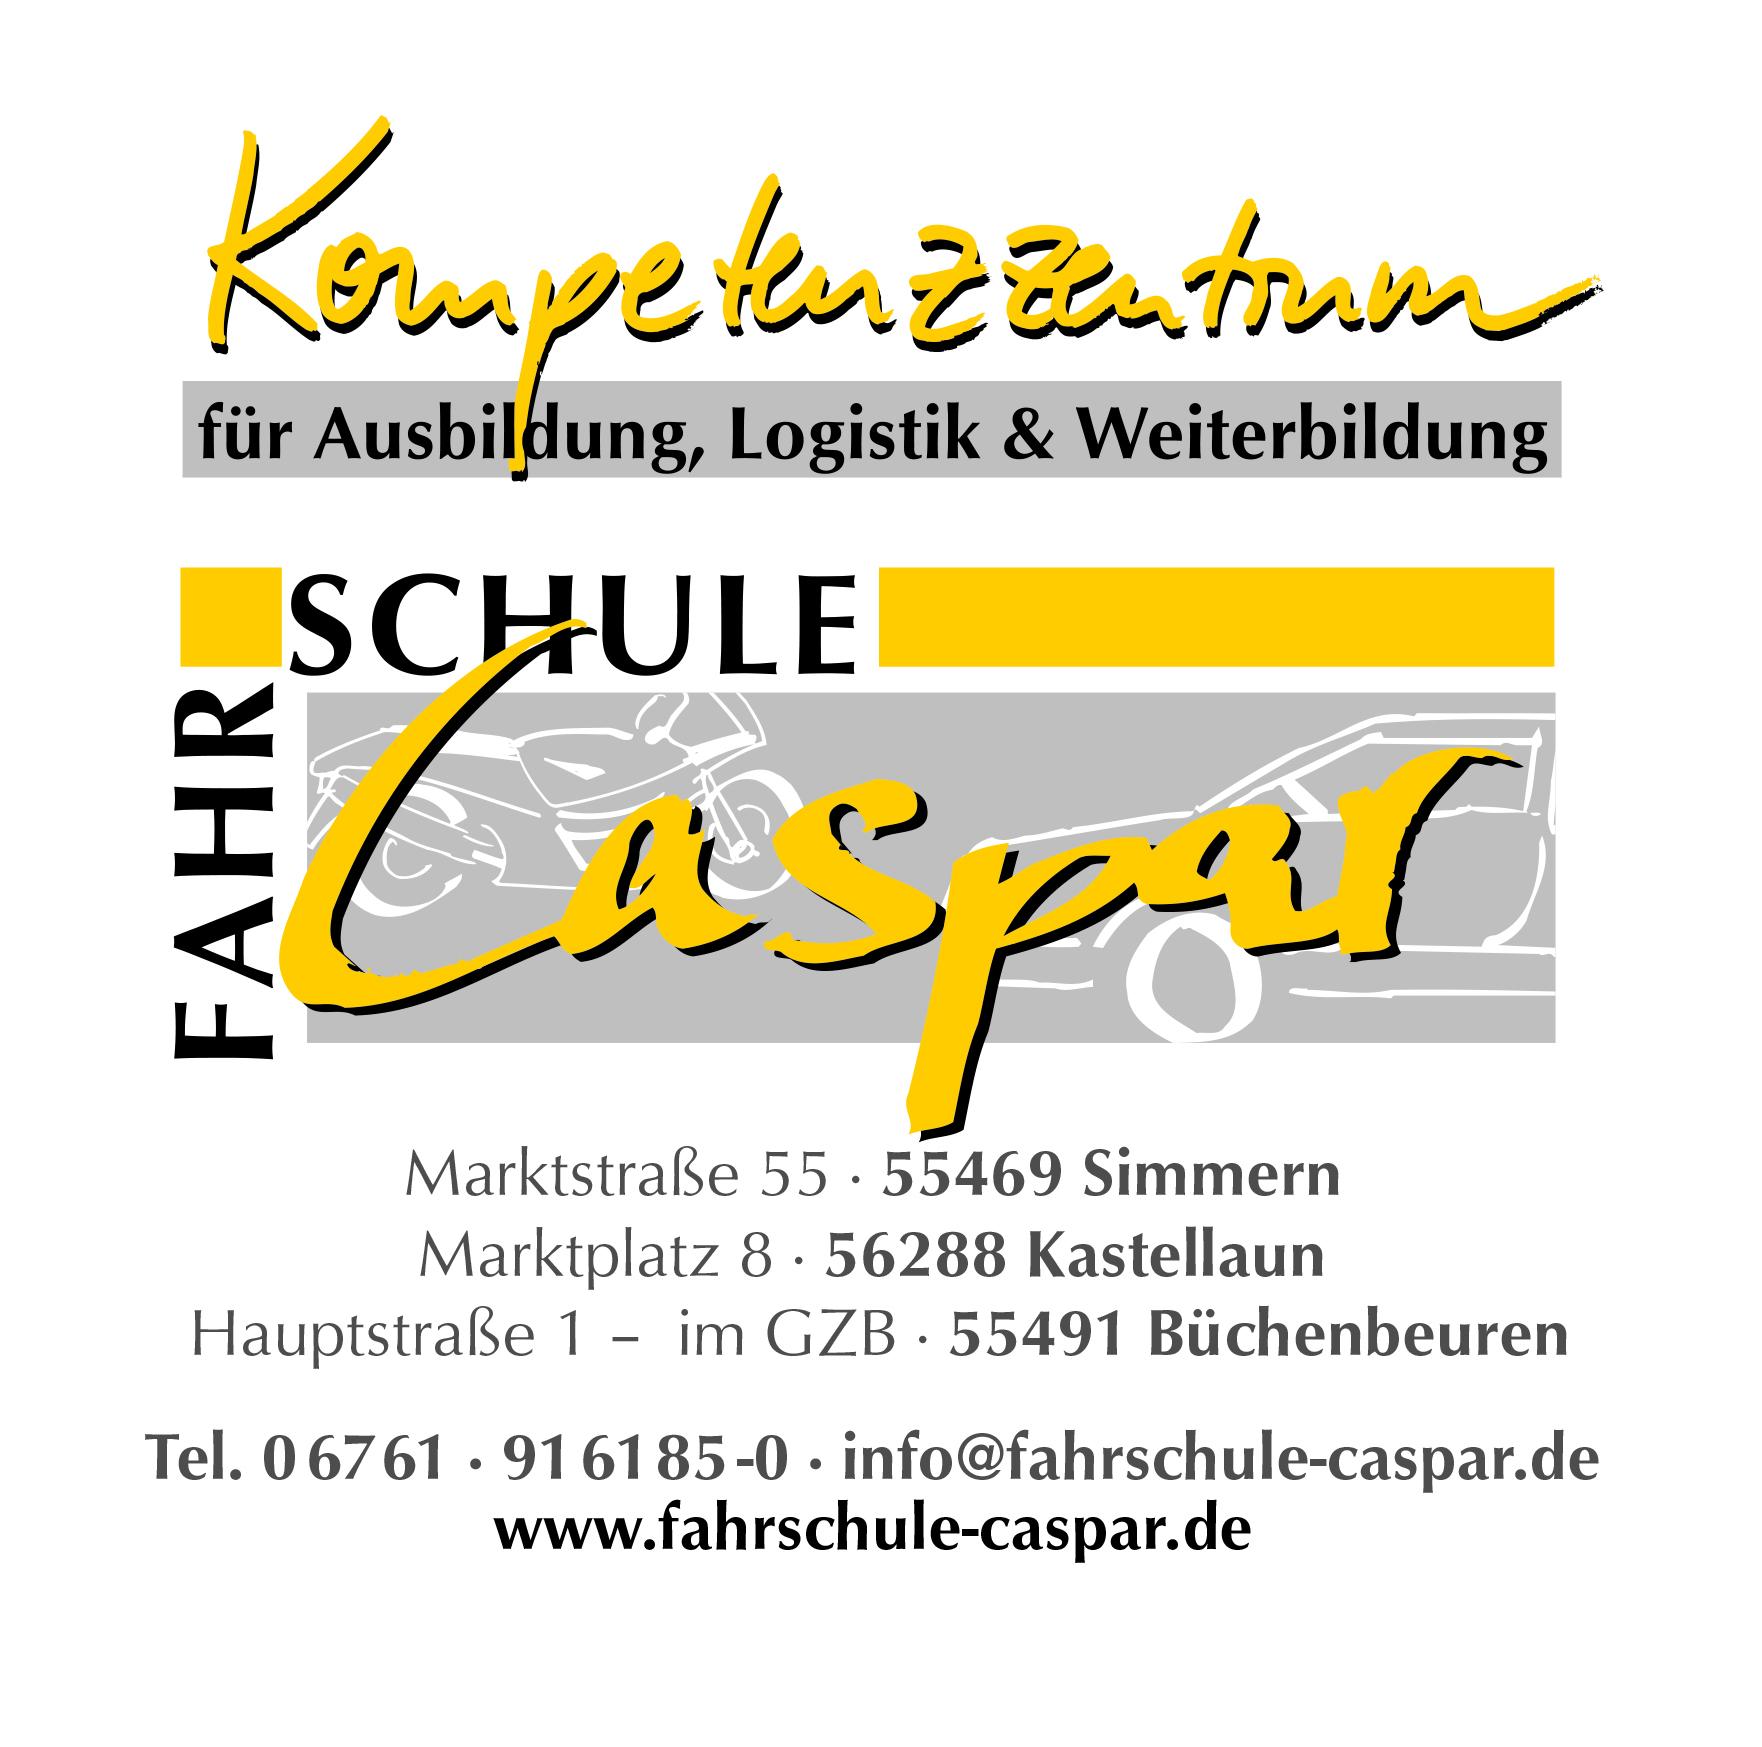 Kompetenzzentrum Fahrschule Caspar